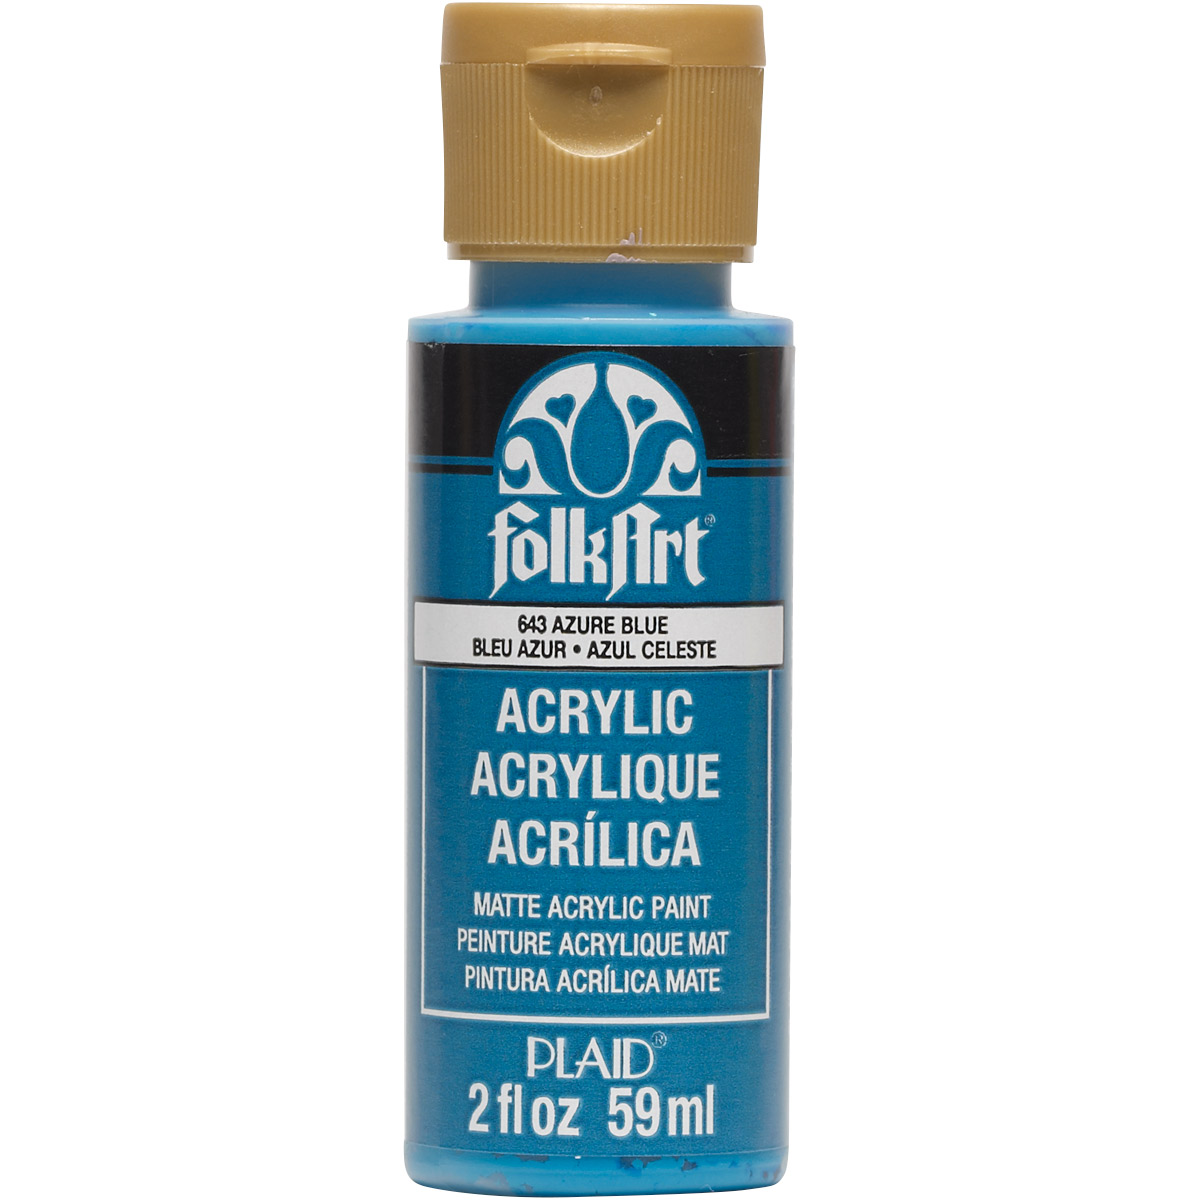 FolkArt ® Acrylic Colors - Azure Blue, 2 oz.